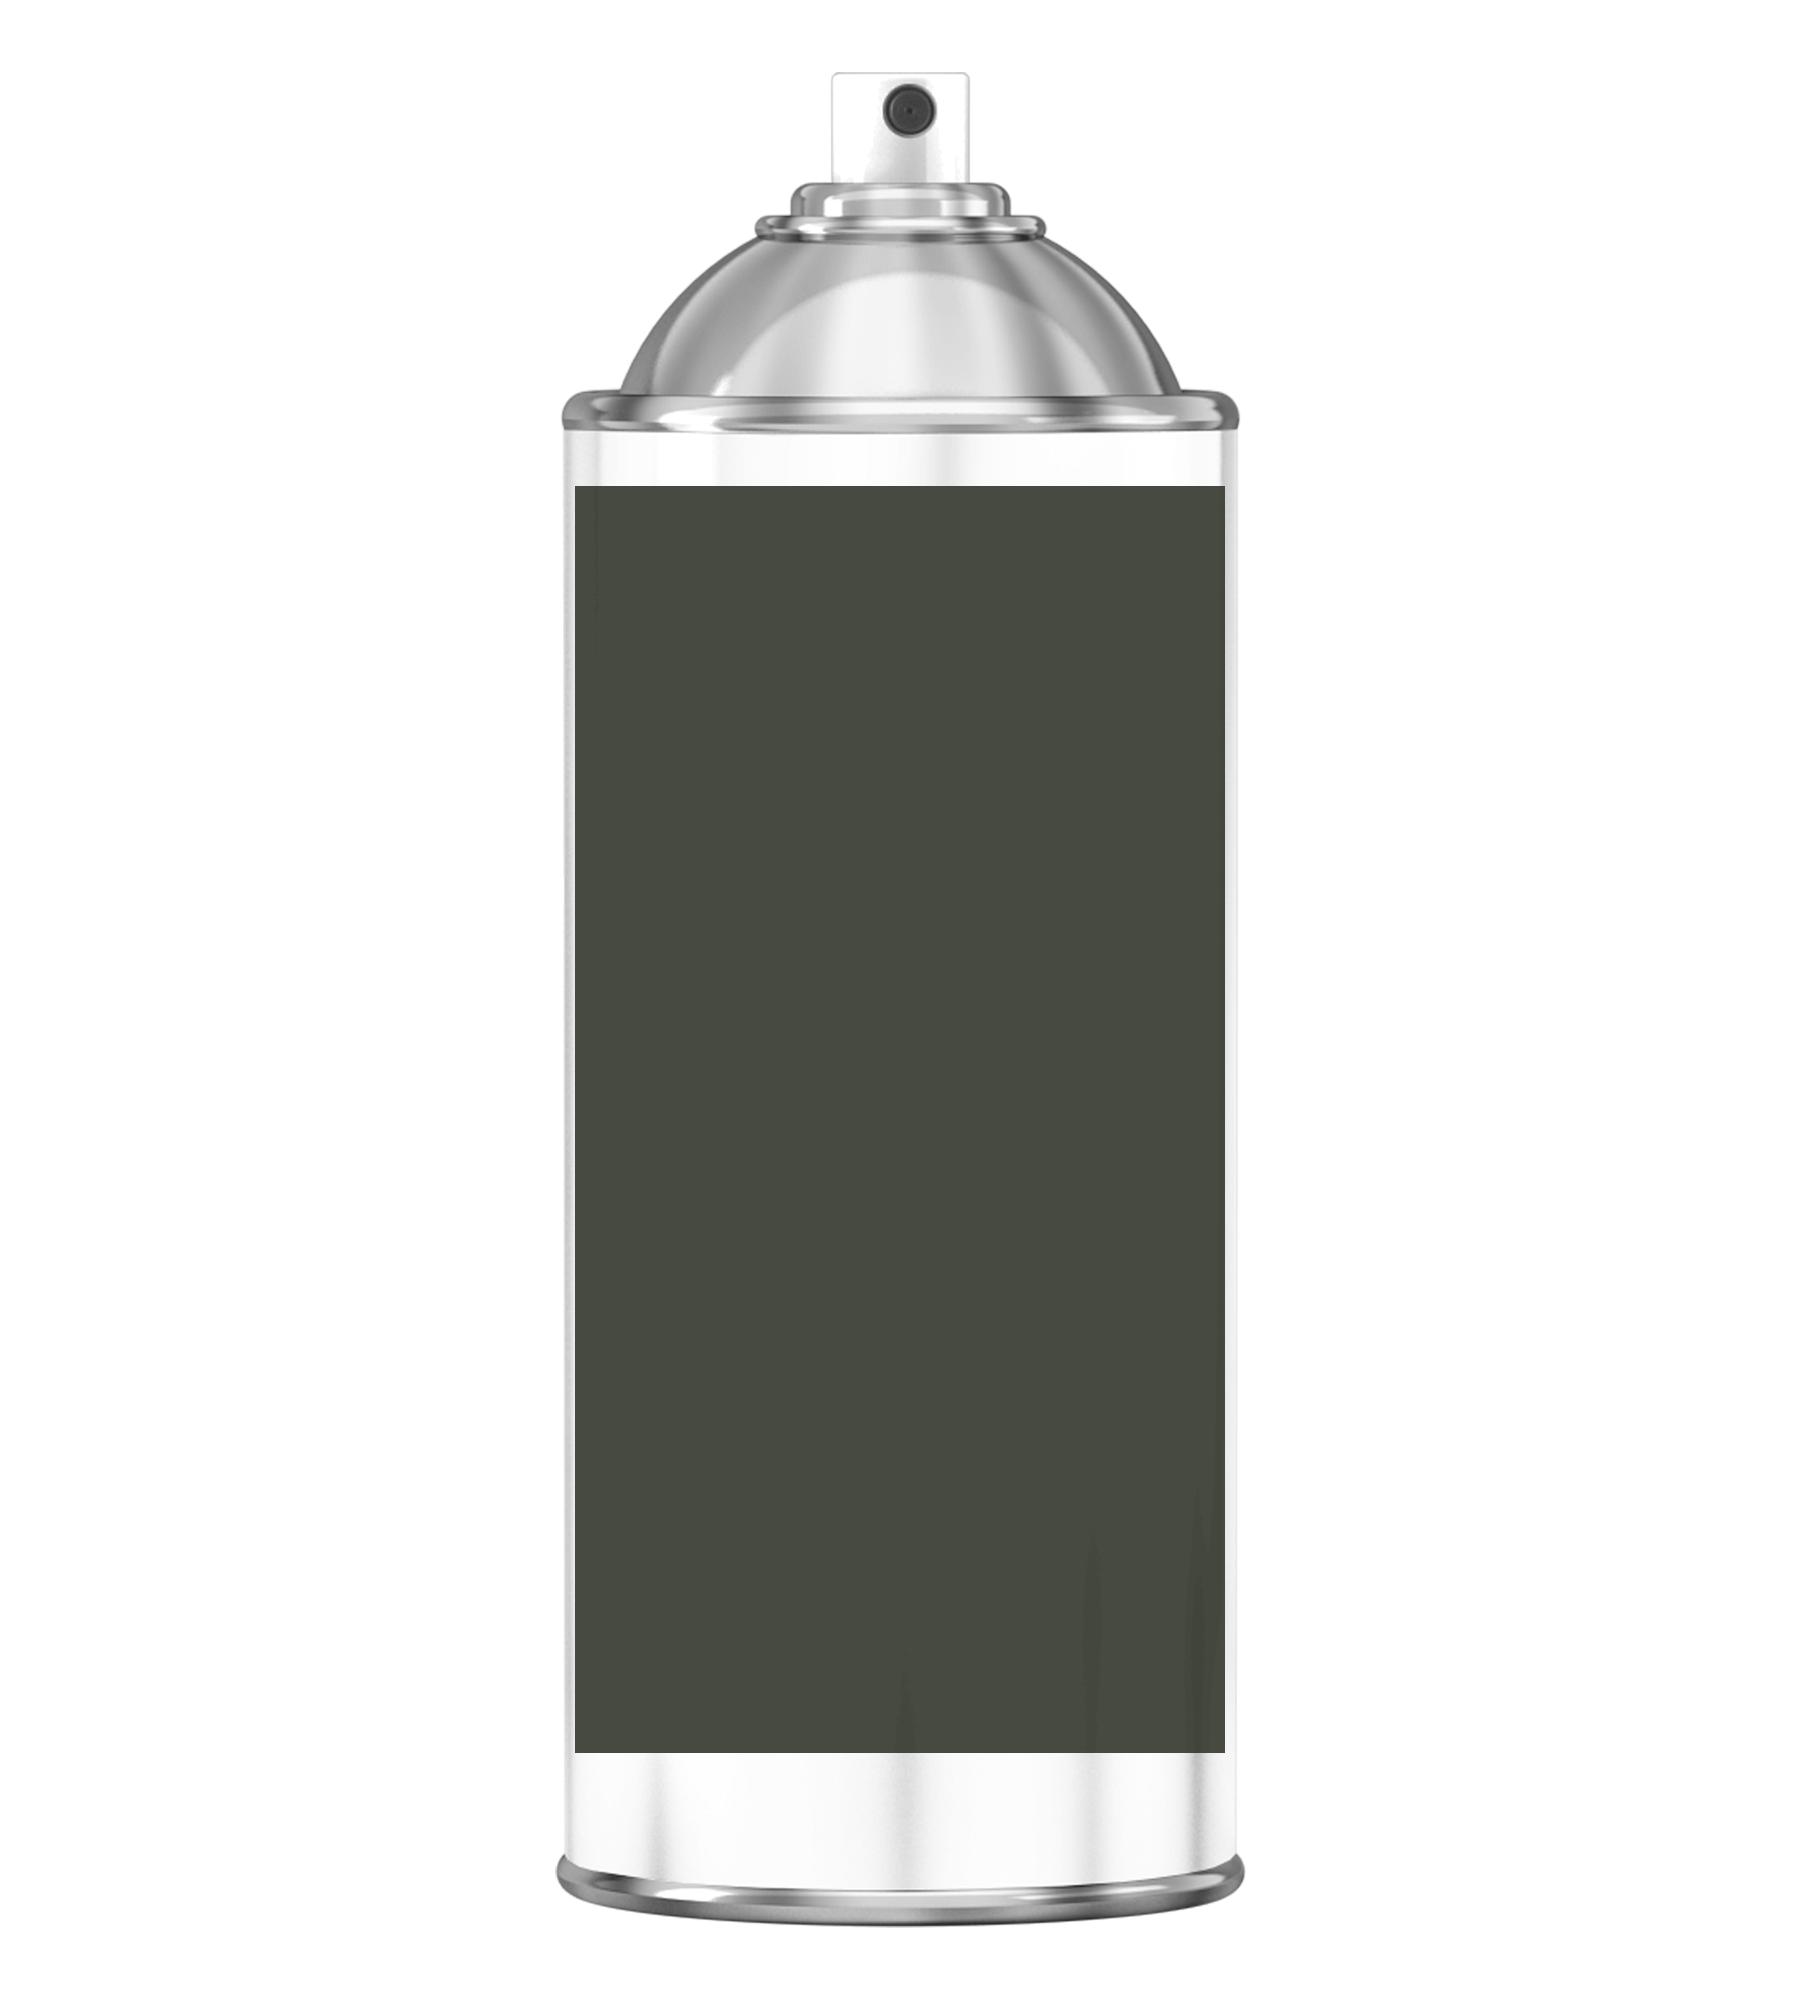 RAL 6008 Brown green Sprayburk